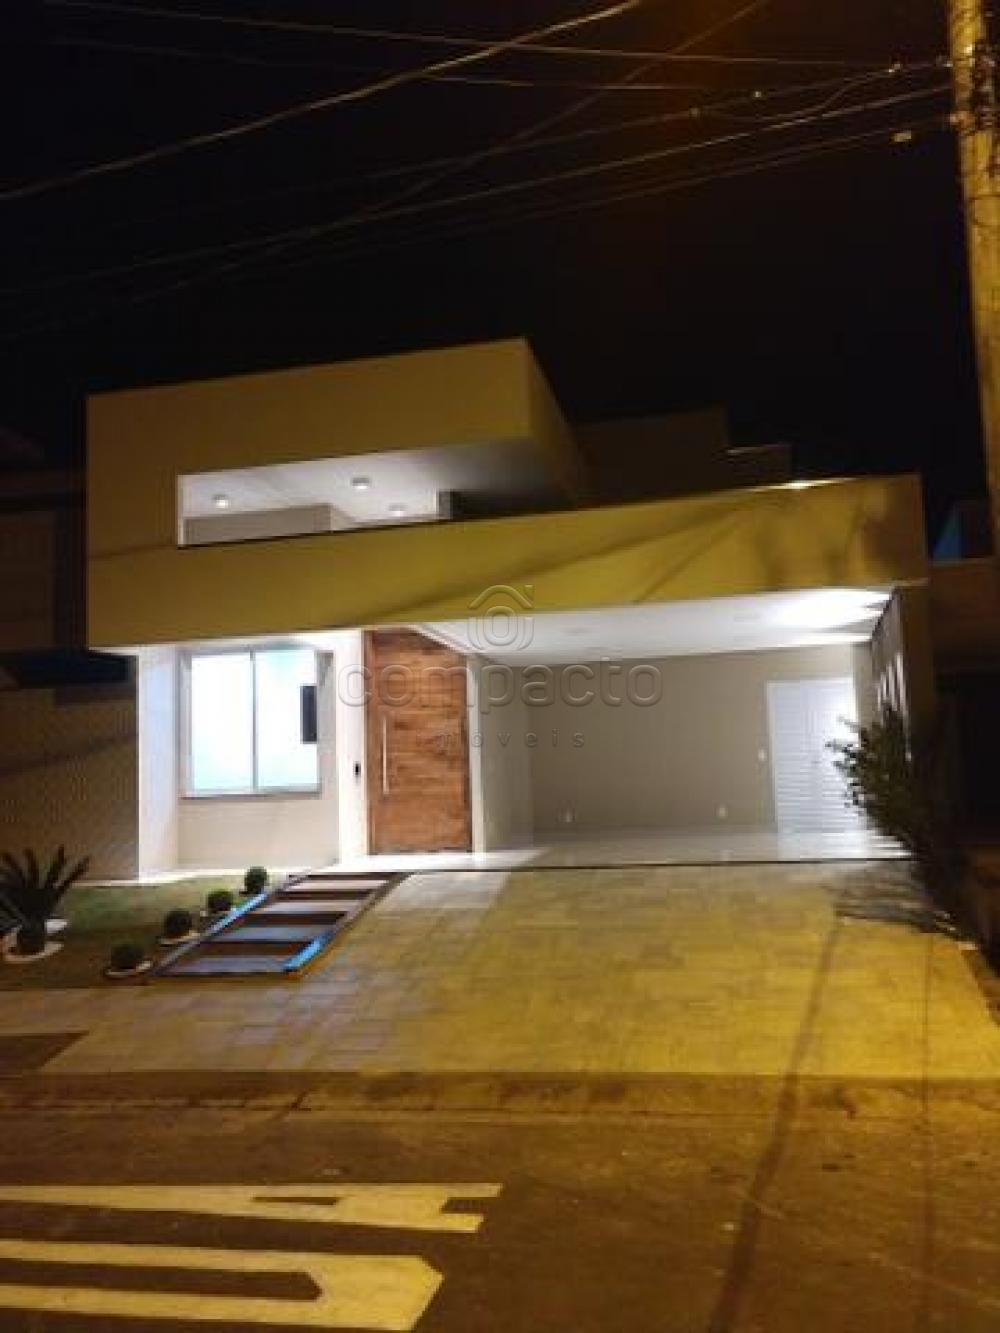 Sao Jose do Rio Preto Casa Venda R$770.000,00 Condominio R$370,00 3 Dormitorios 3 Suites Area construida 182.00m2